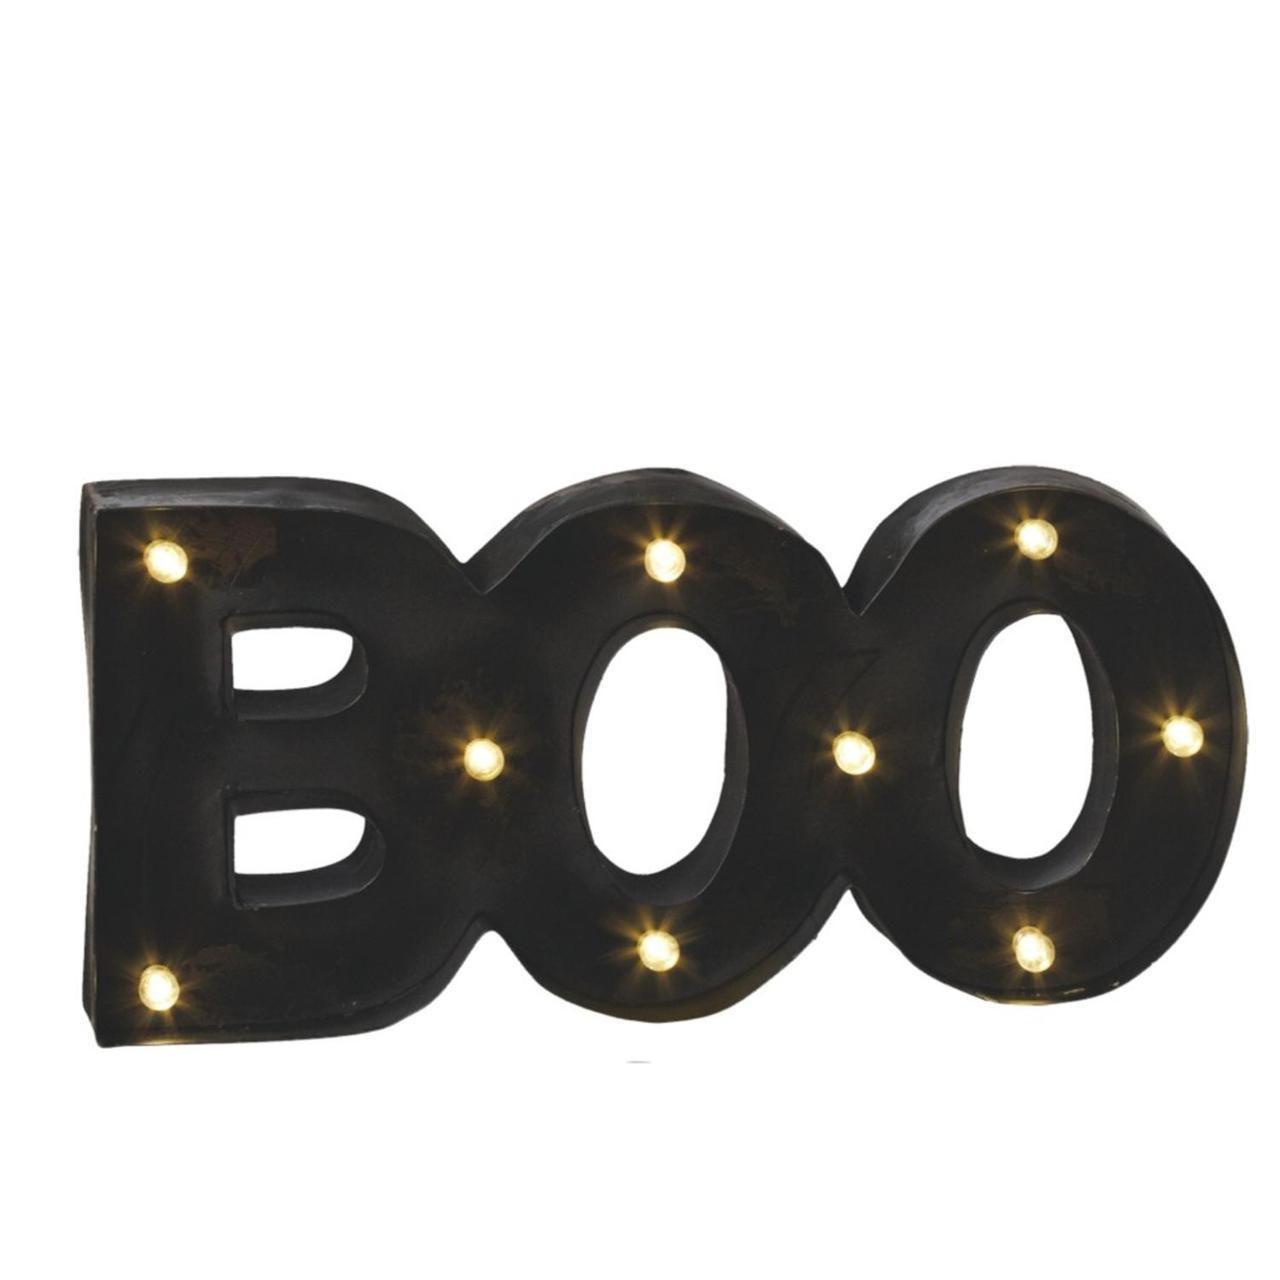 "Black LED Lighted ""BOO"" Halloween Wall Decor 8"" X 17.25"